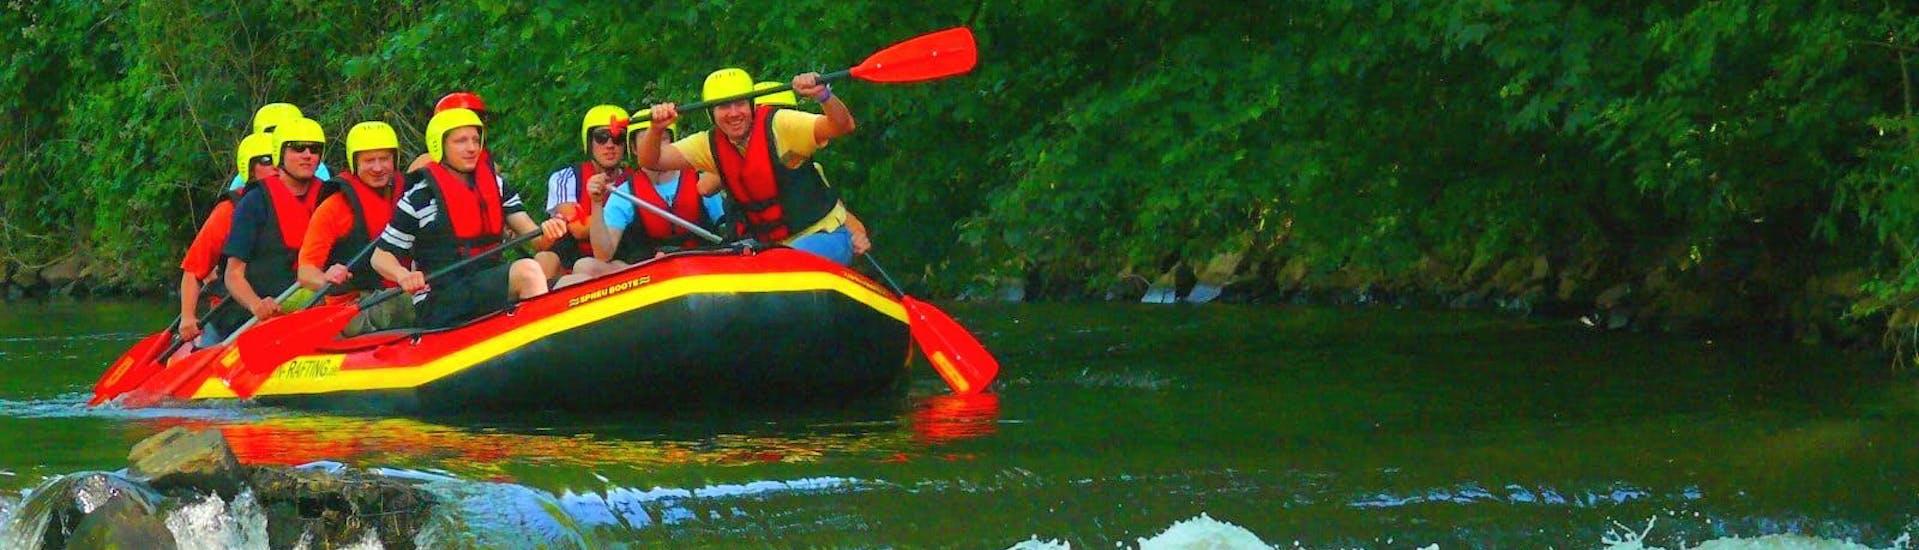 soft-rafting-on-erft-rhine-in-duesseldorf-for-groups-wupperkanu-hero